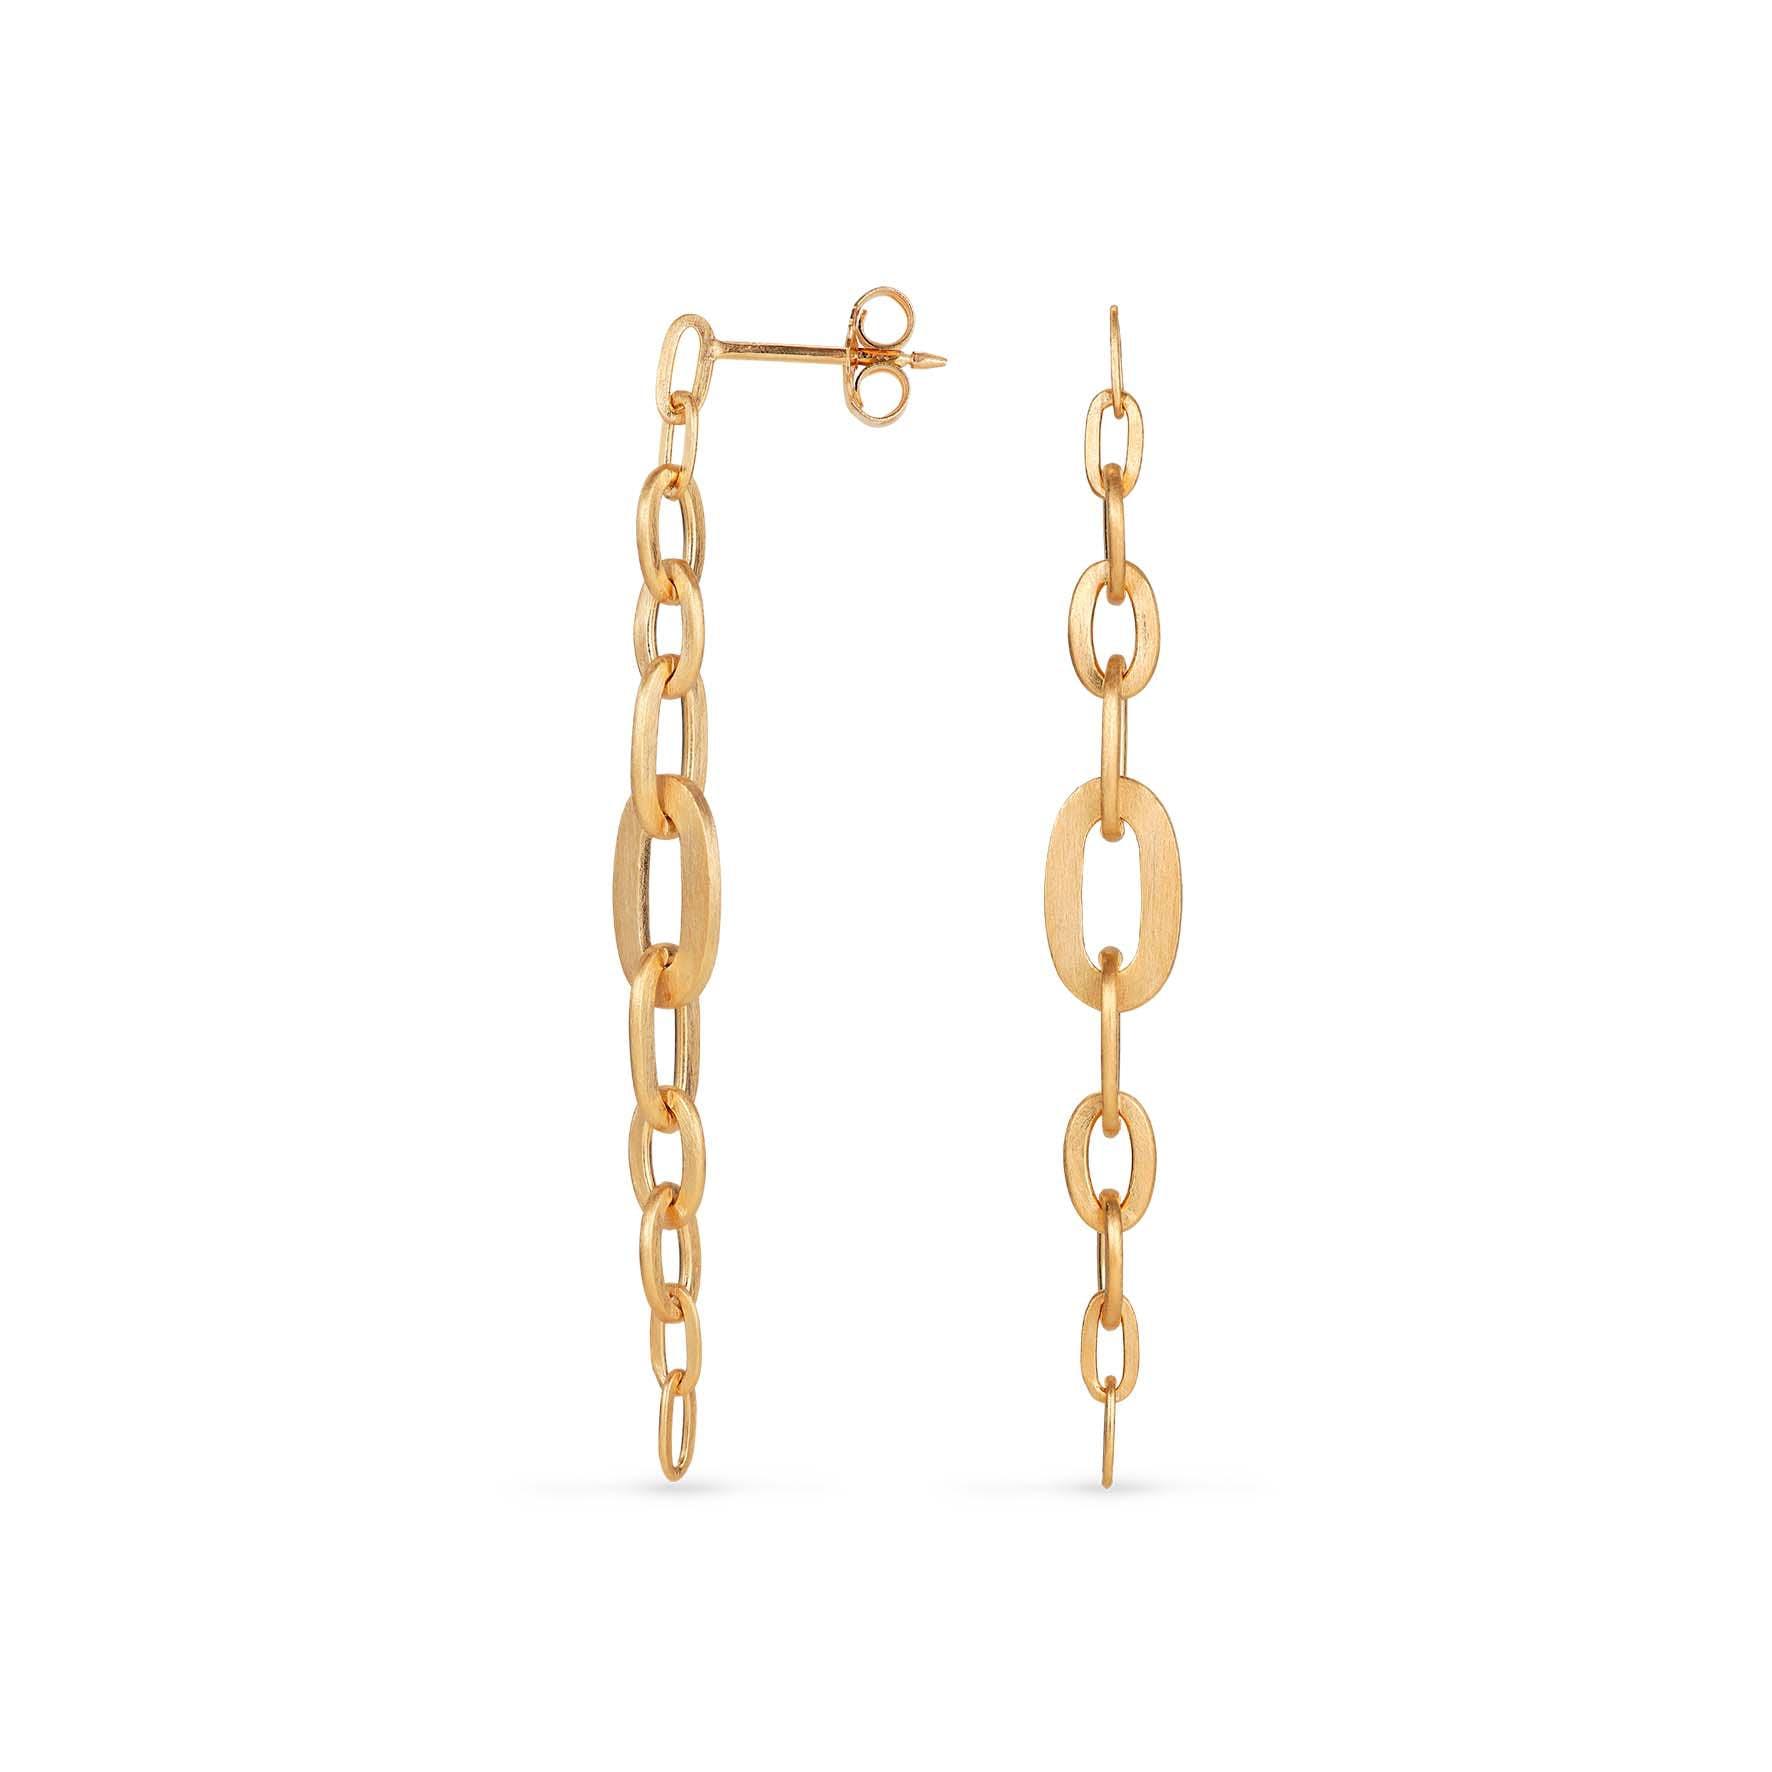 Row Chain Earring von Jane Kønig in Vergoldet-Silber Sterling 925